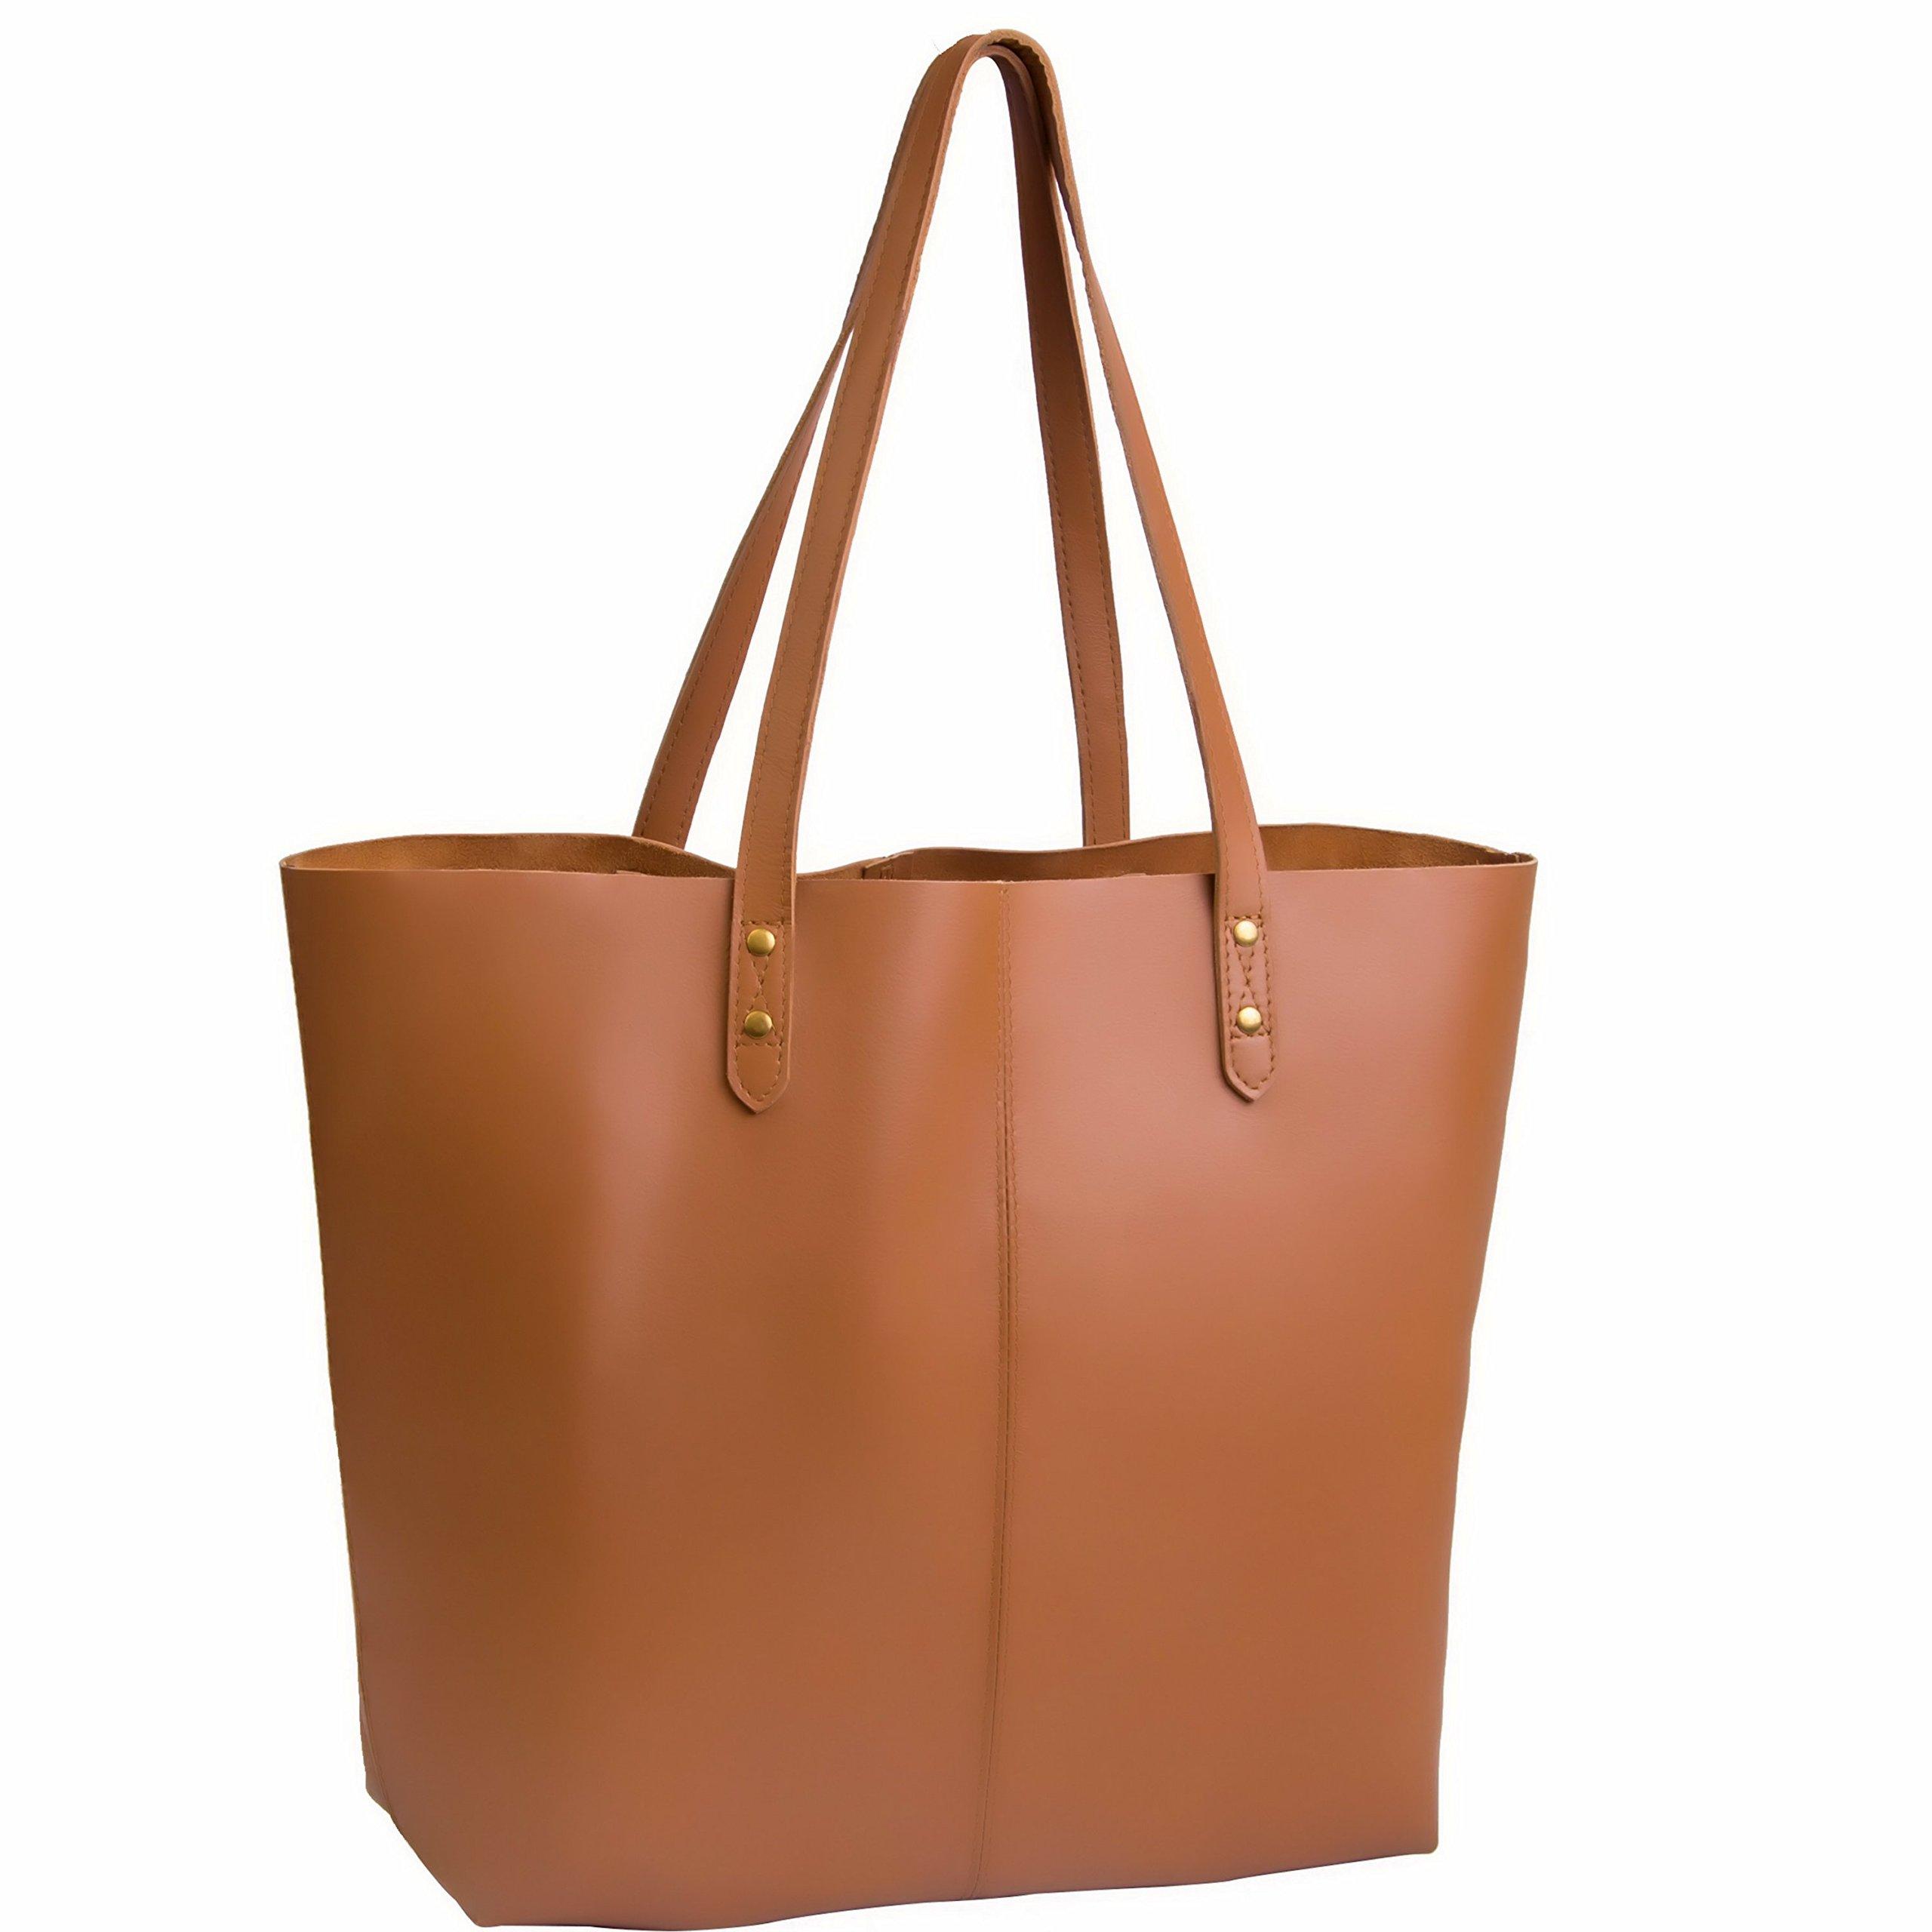 Large, Coffee NOTAG Messenger Bag Genuine Leather Briefcase Casual Busienss Laptop Tote Handbag Large Capacity Shoulder Bag Vintage Crossbody Bag Satchel Purse for Men,2 Size